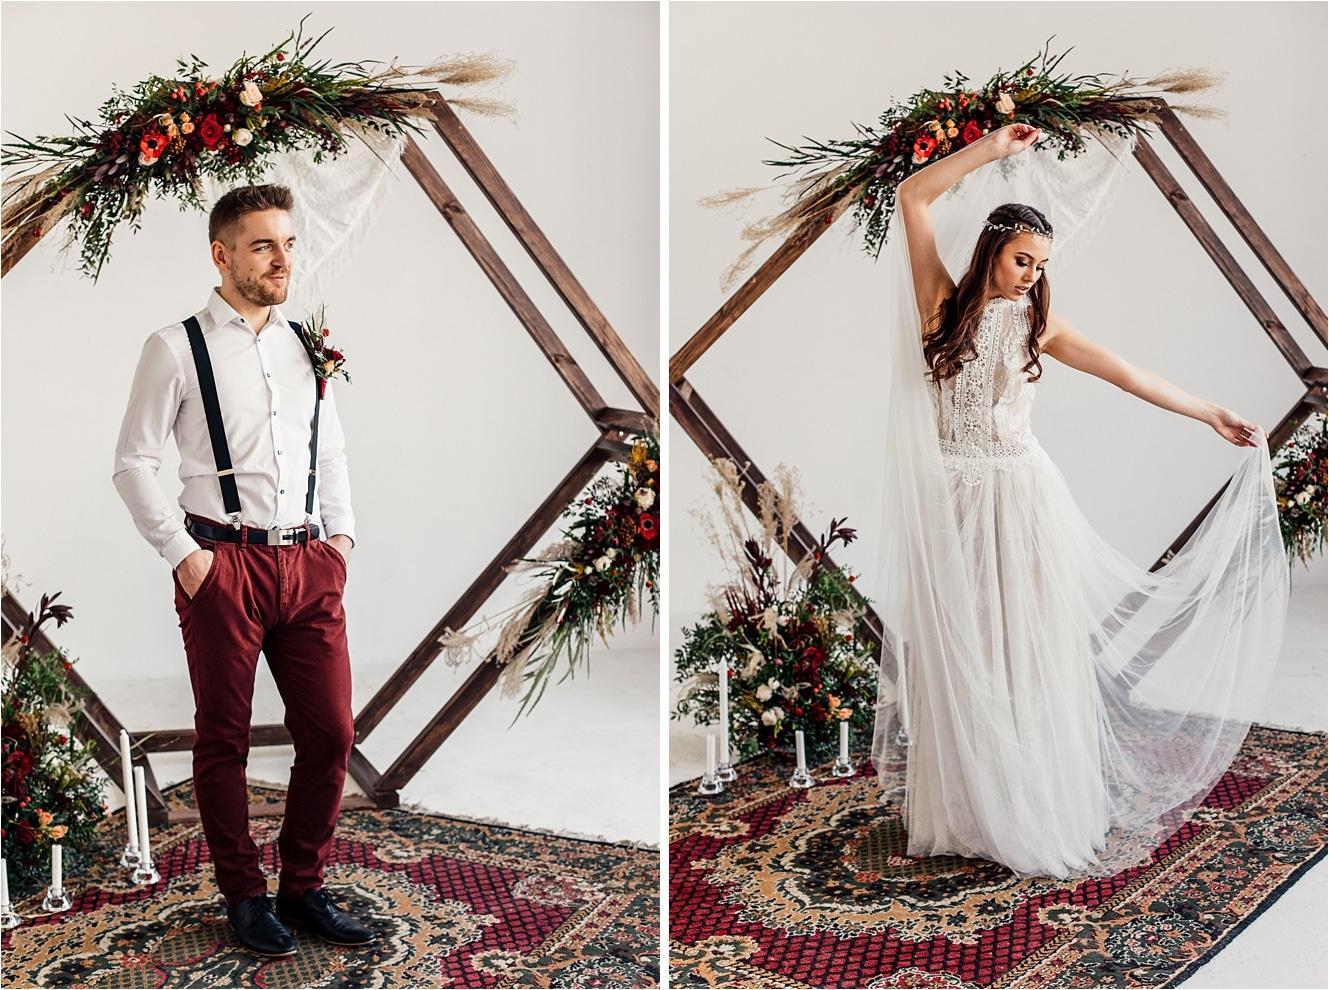 mleko studio poznan, z bliska fotografia,  fotograf poznan, sesja stylizowana, slub 2019, slub 2020